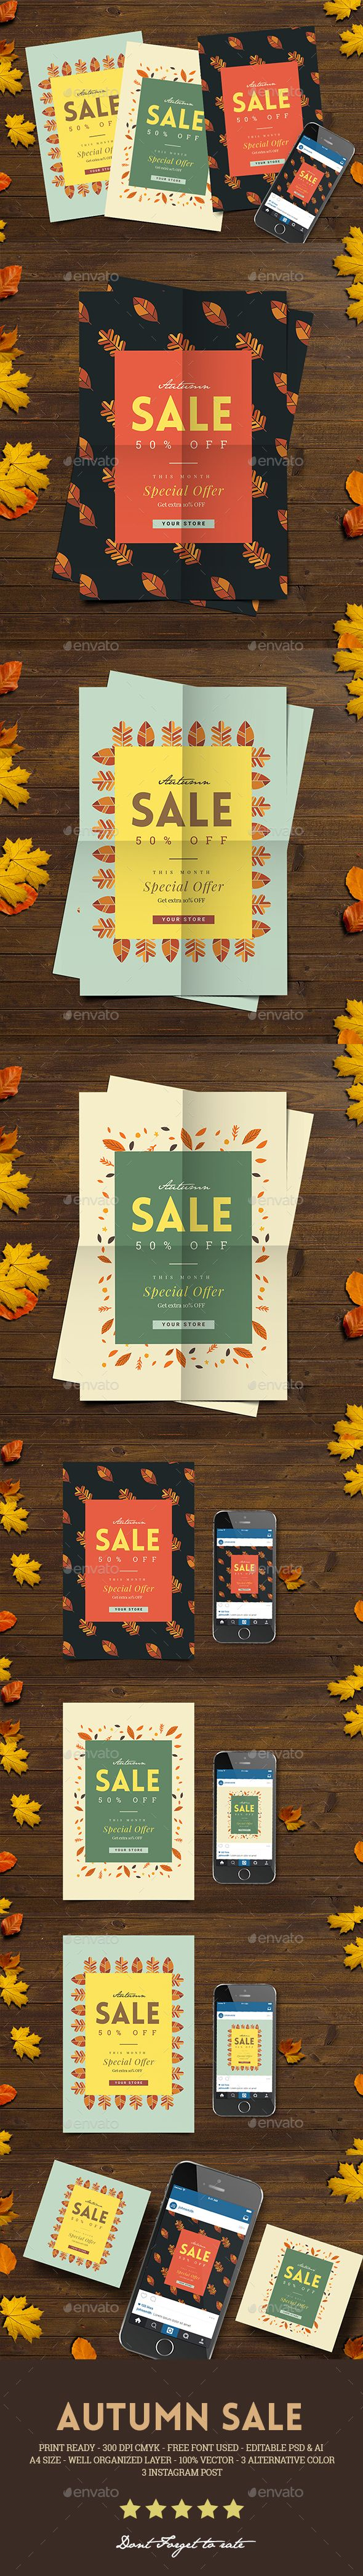 Autumn Sale Flyer Instagram Post